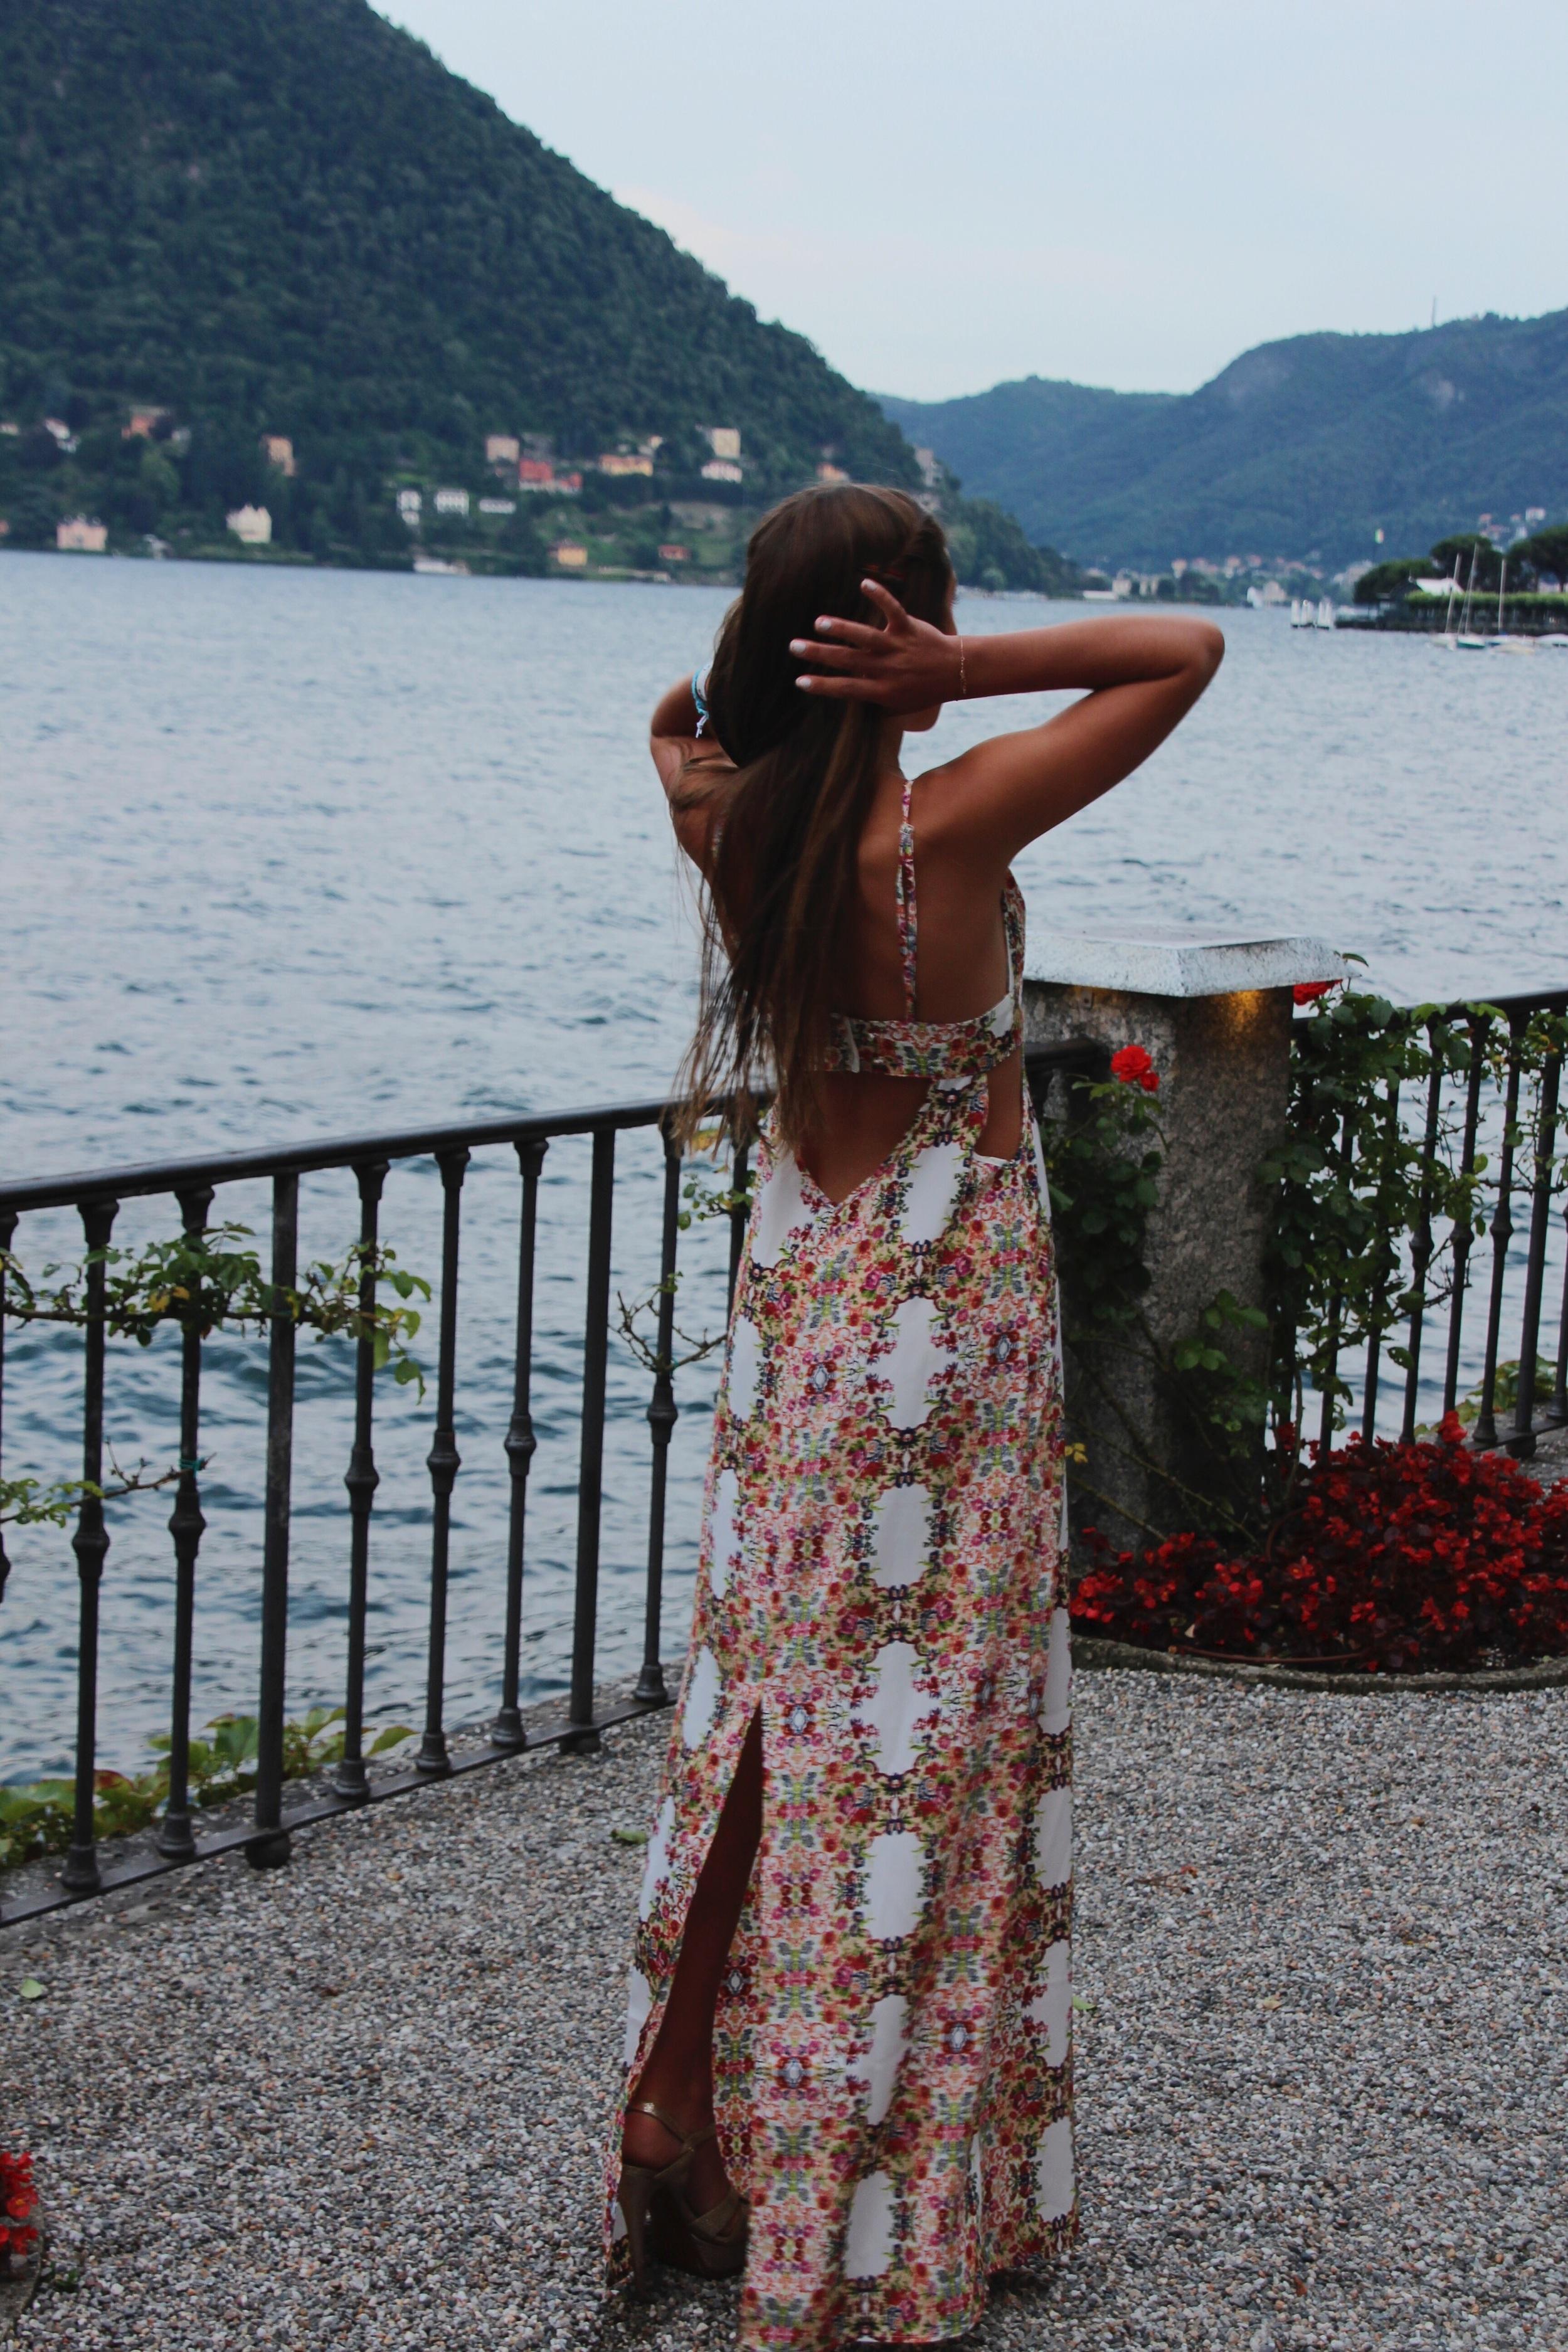 Villa de Este located on Lake Como